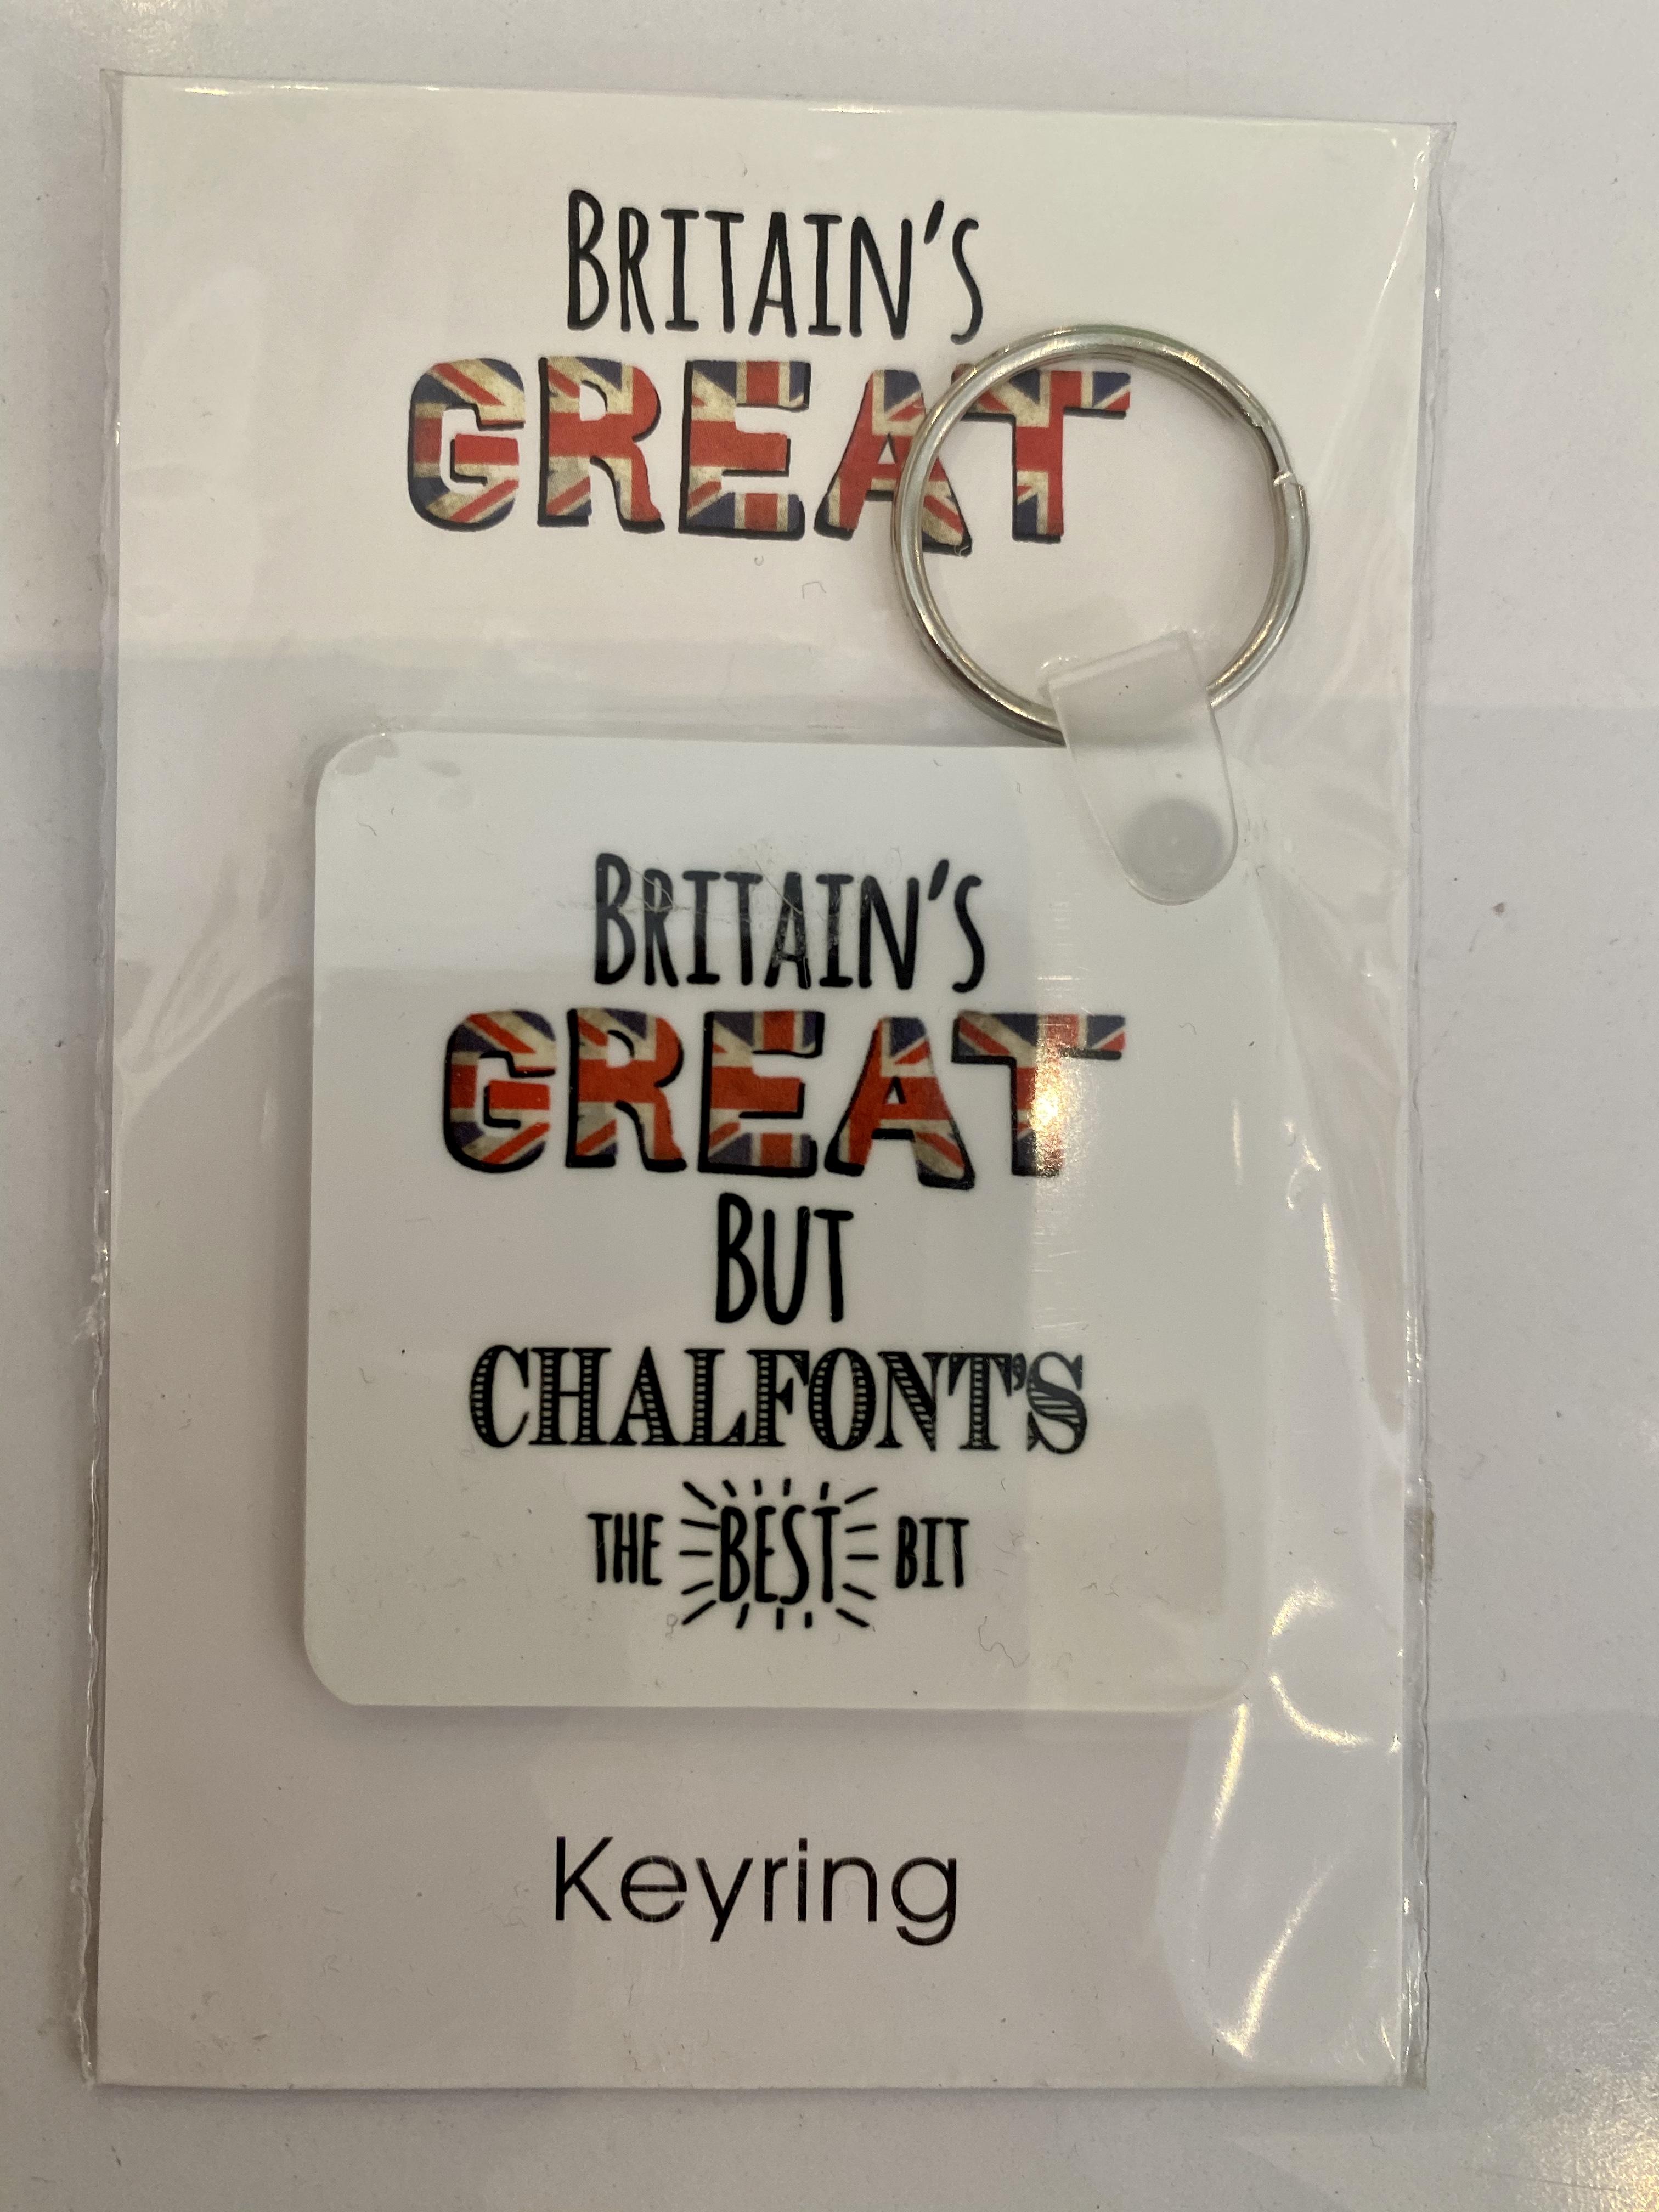 Chalfont key ring